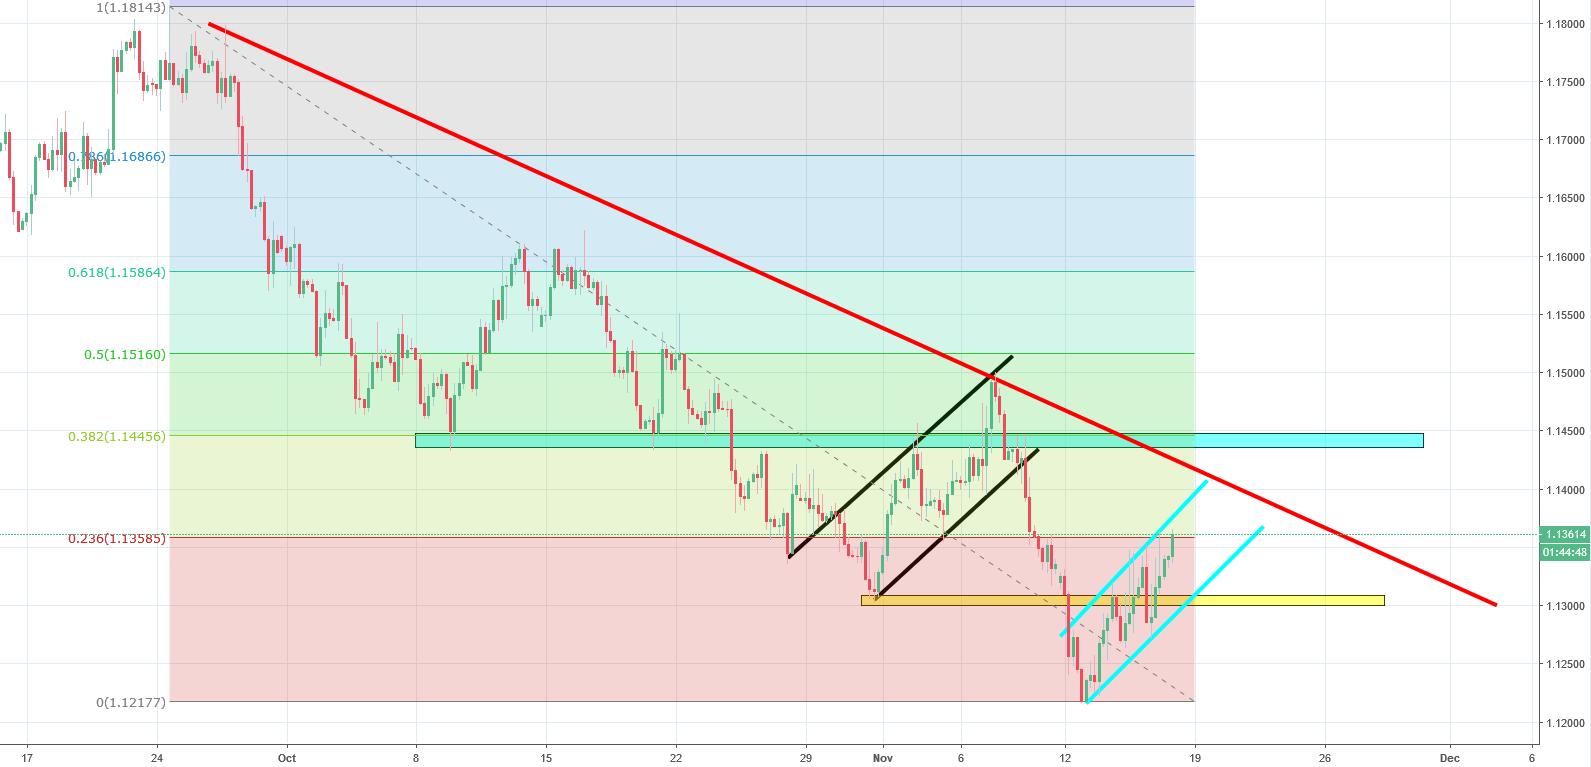 EURUSD Analysis - could the bullish correction trigger a buy signal?